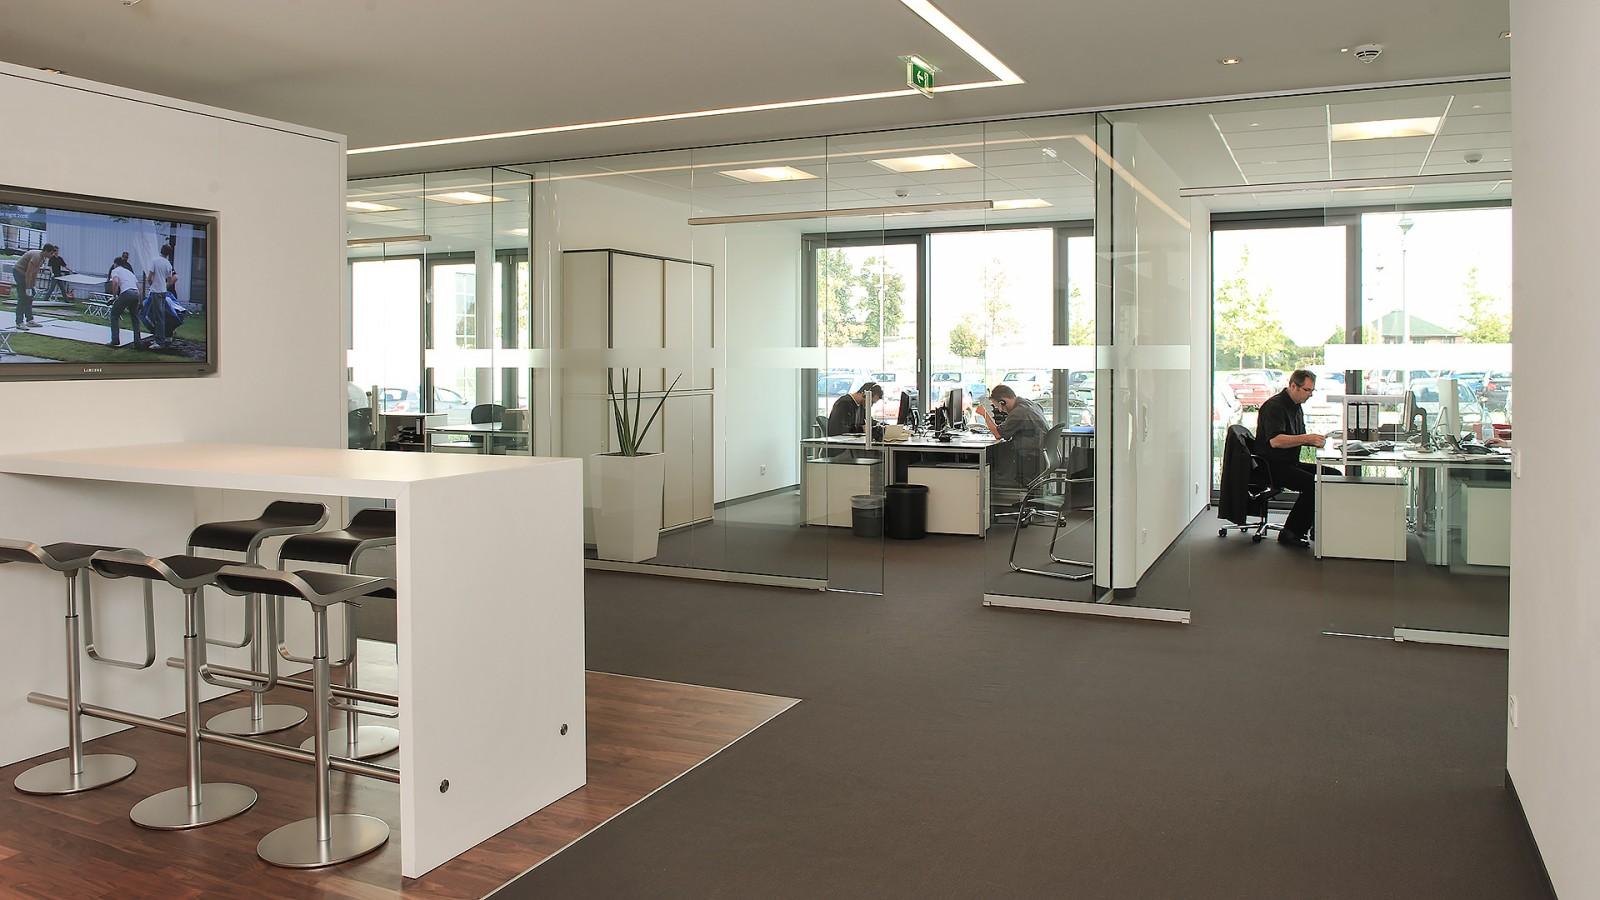 Medifox Hildesheim - JUNG - Architekturbüro, Innenarchitekturbüro ...